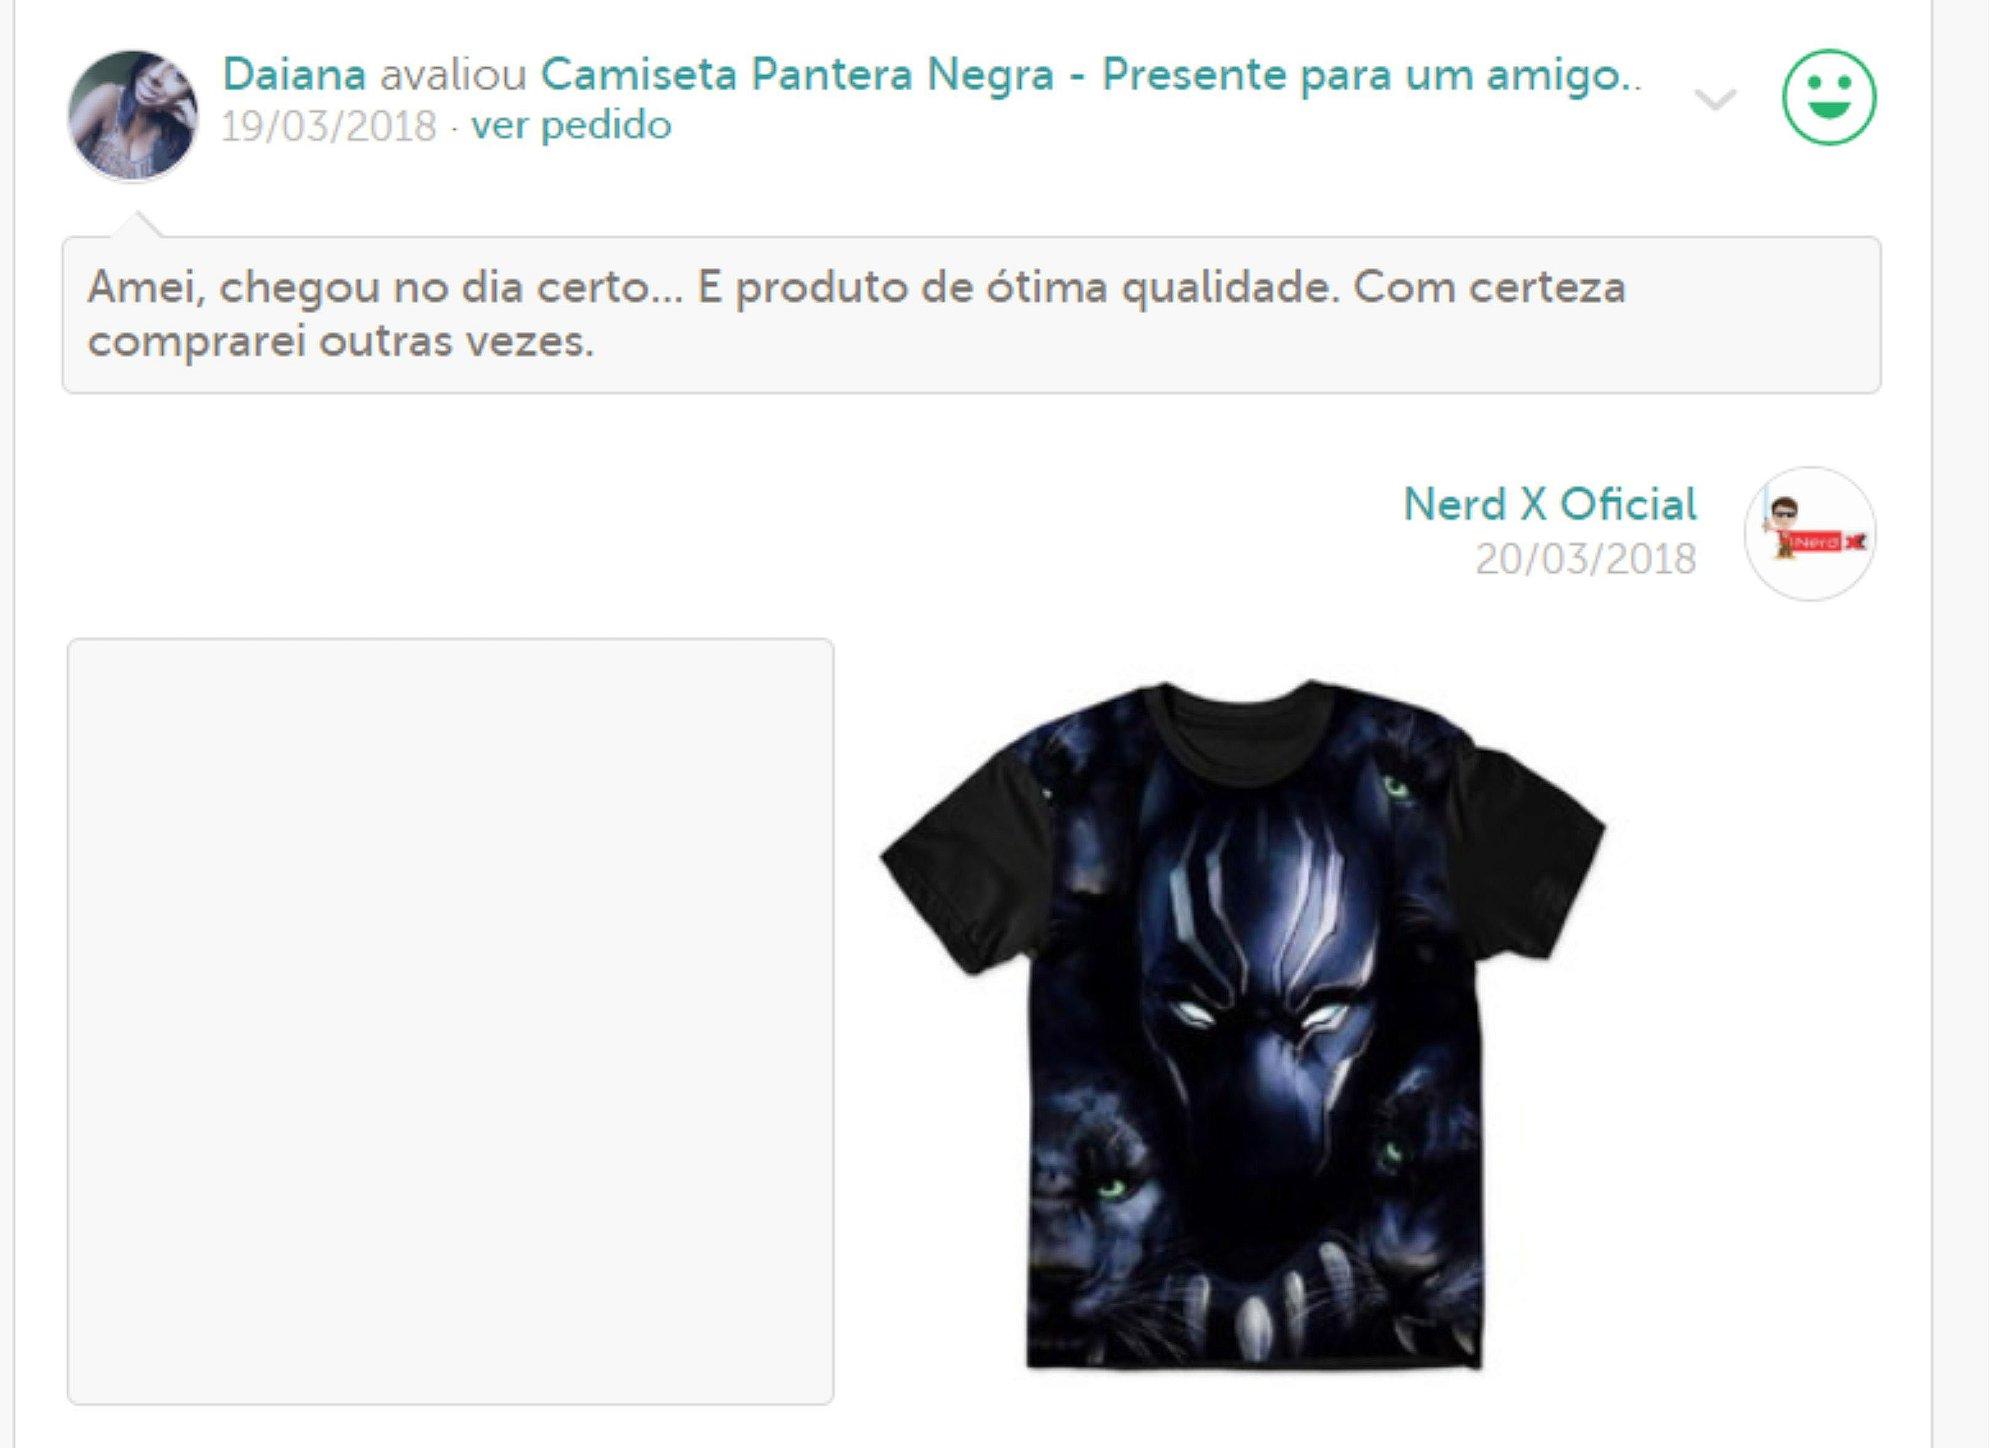 3c3c5c4b11 Camisa Caveira - Nerd X - Cultura Pop com Estilo